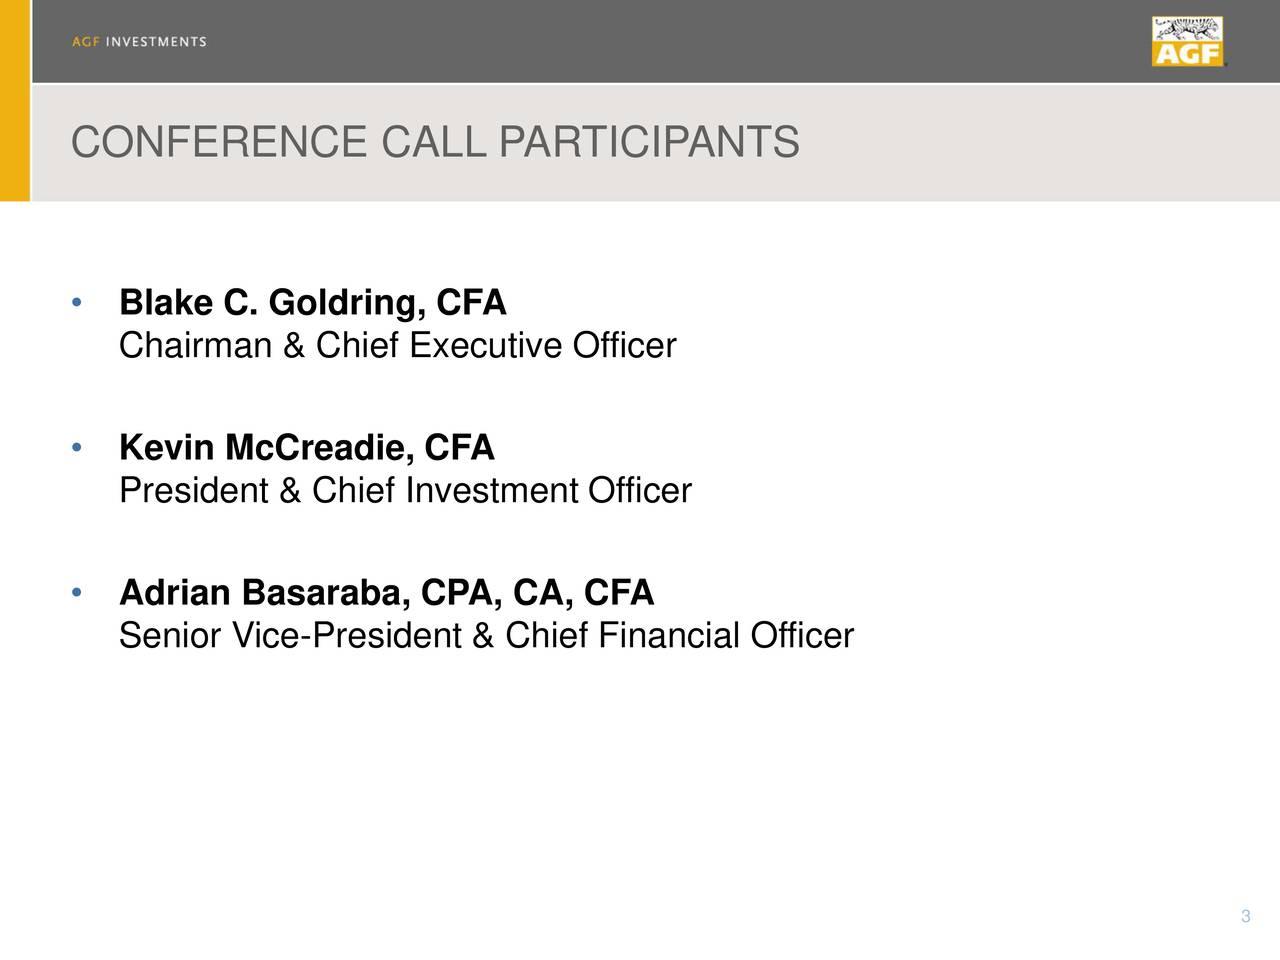 Blake C. Goldring, CFA Chairman & Chief Executive Officer Kevin McCreadie, CFA President & Chief Investment Officer Adrian Basaraba, CPA, CA, CFA Senior Vice-President & Chief Financial Officer 3